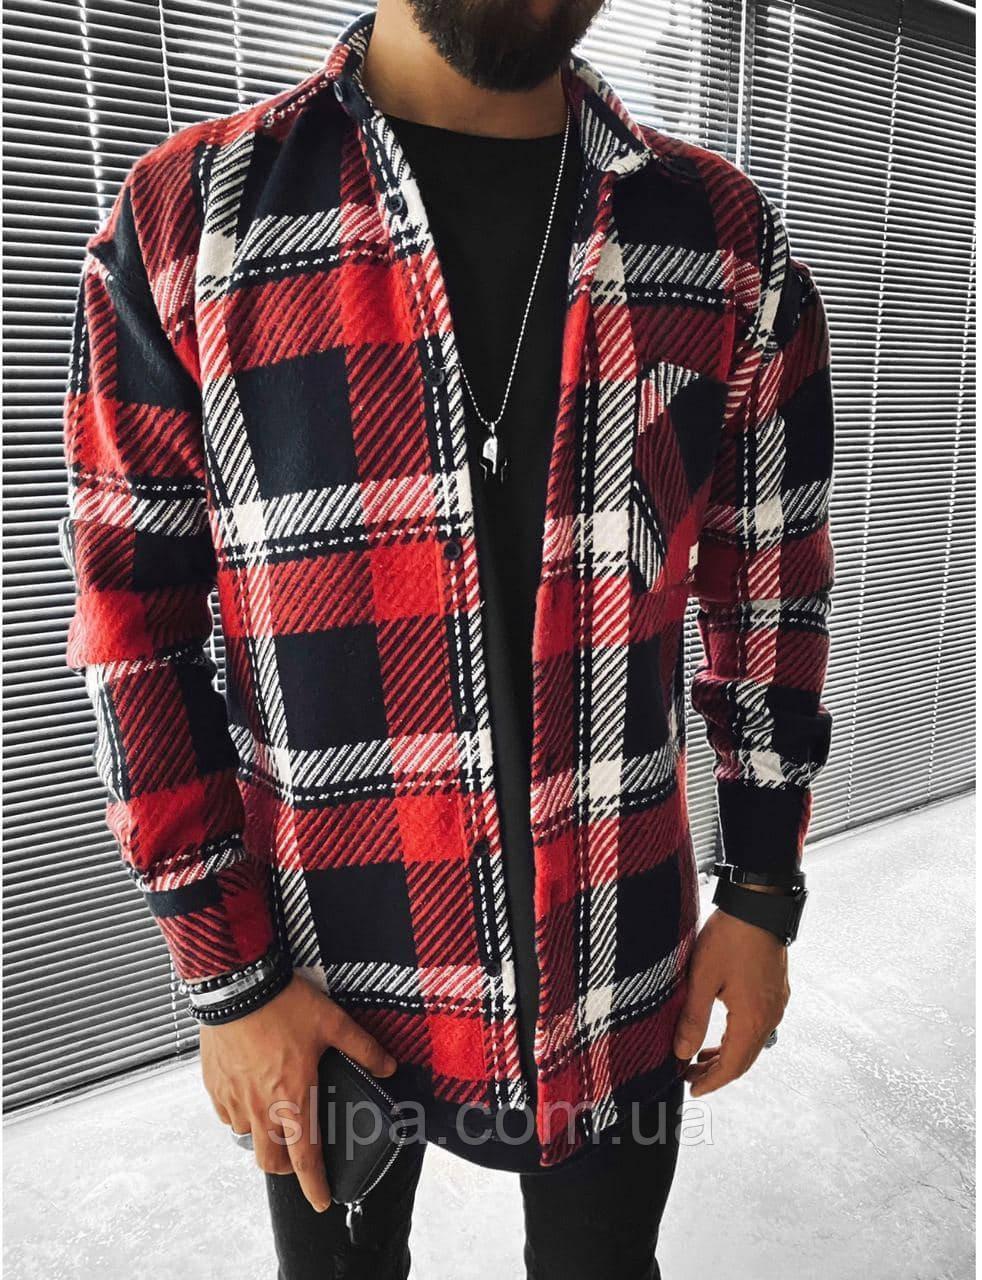 Мужская стильная байковая рубашка оверсайз, красная с чёрным ( Турция )